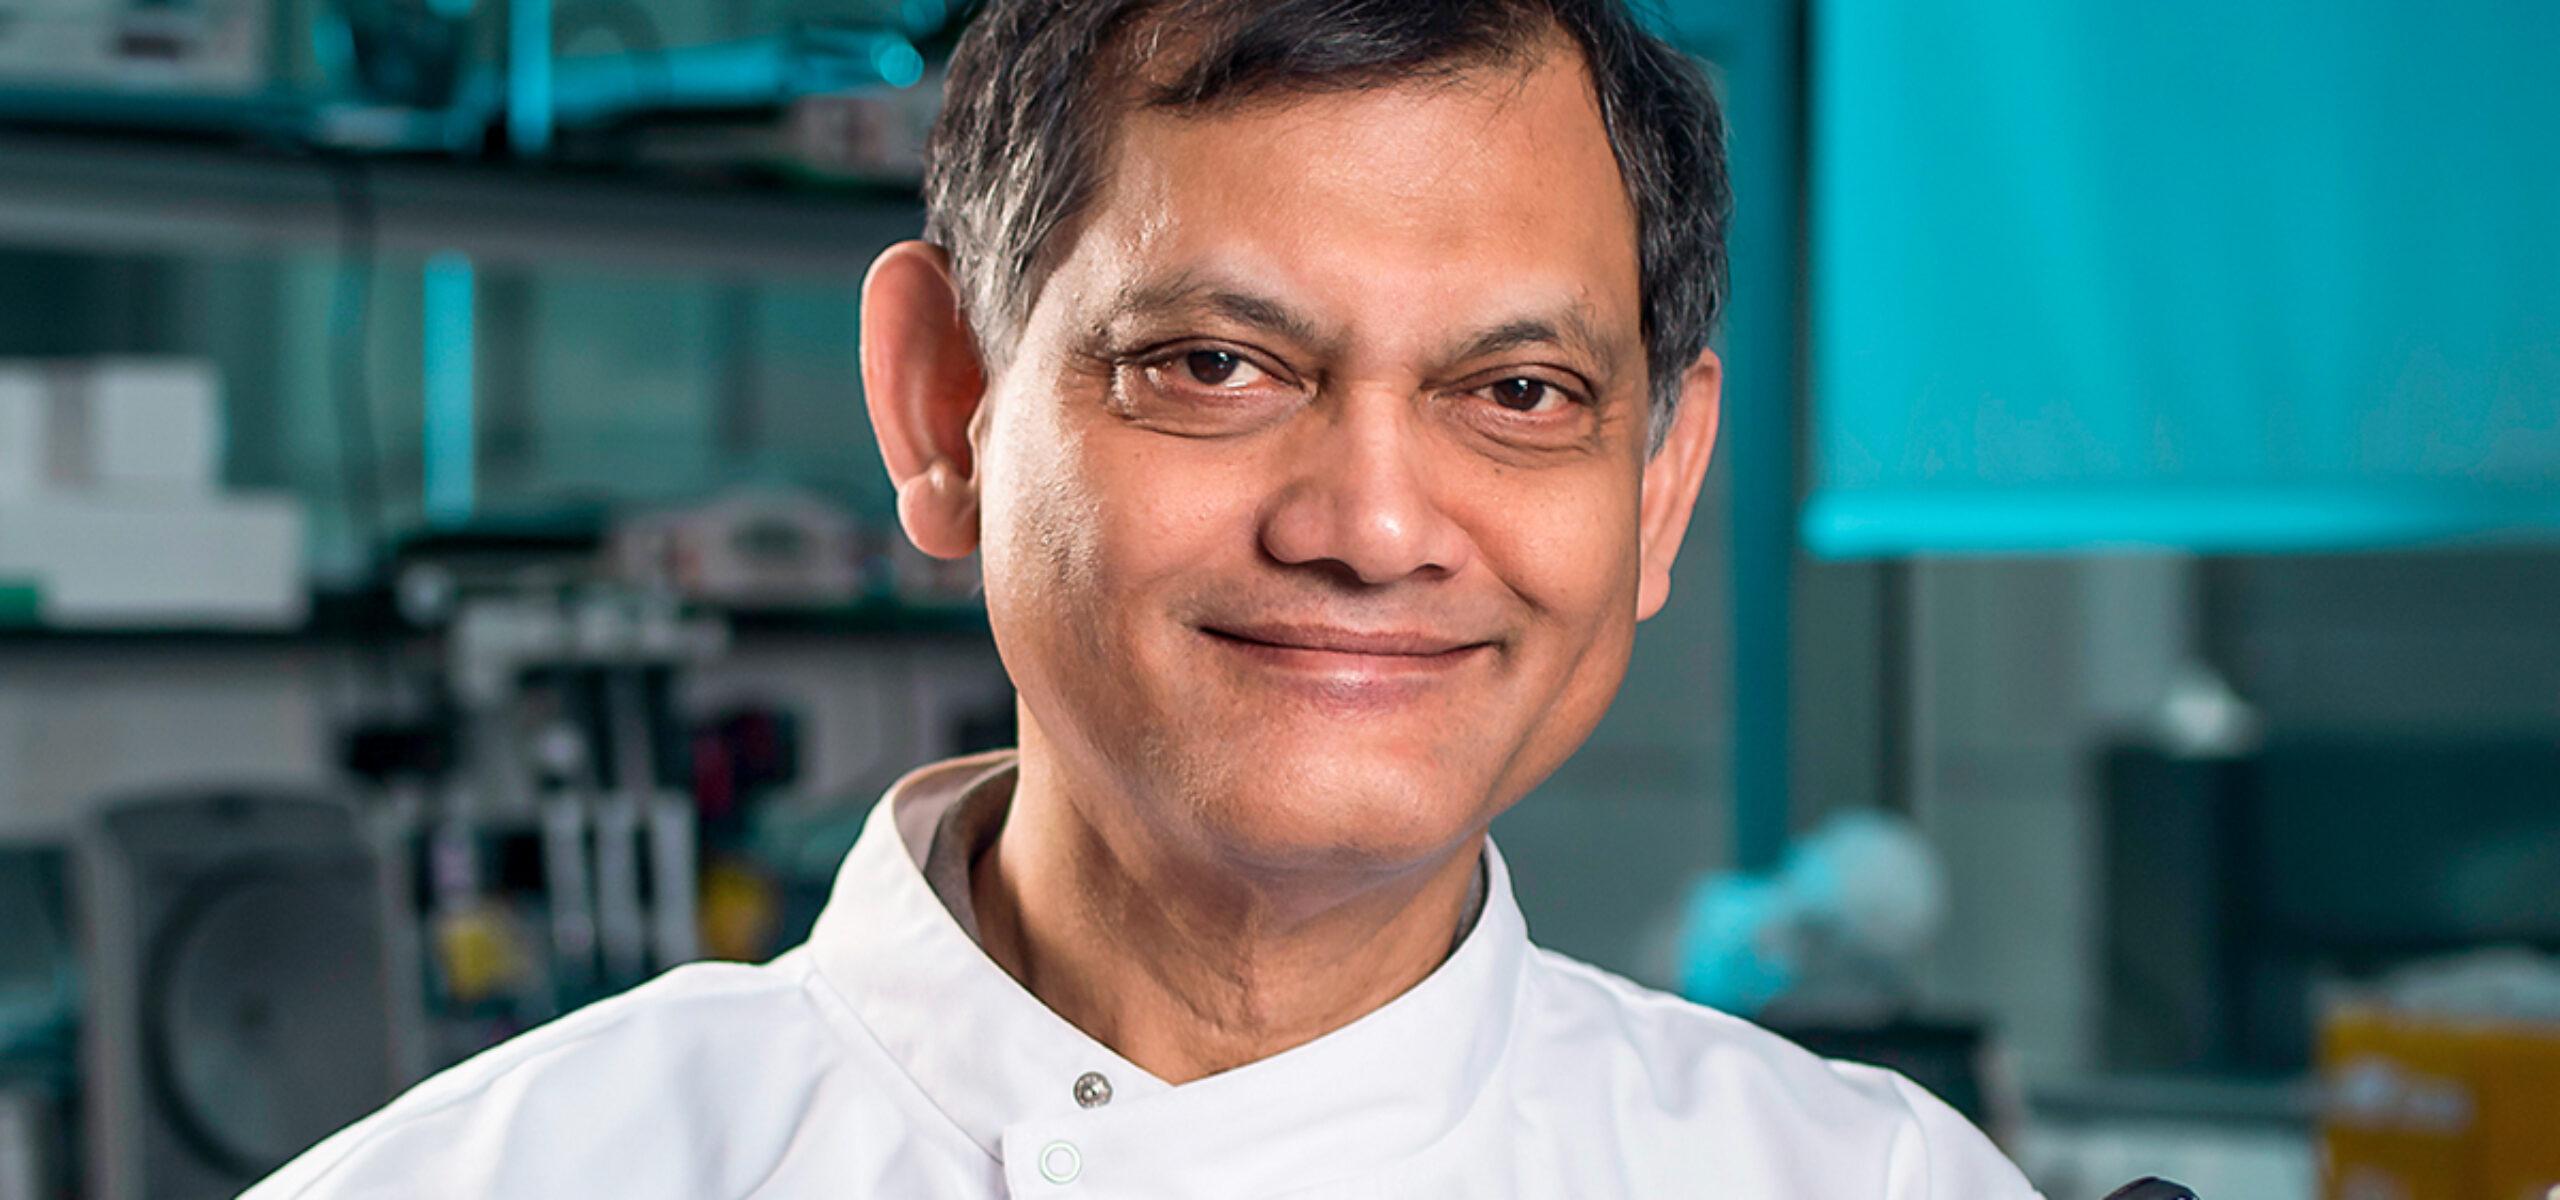 Professor Vaskar Saha, Professor of Paediatric Oncology at The University of Manchester